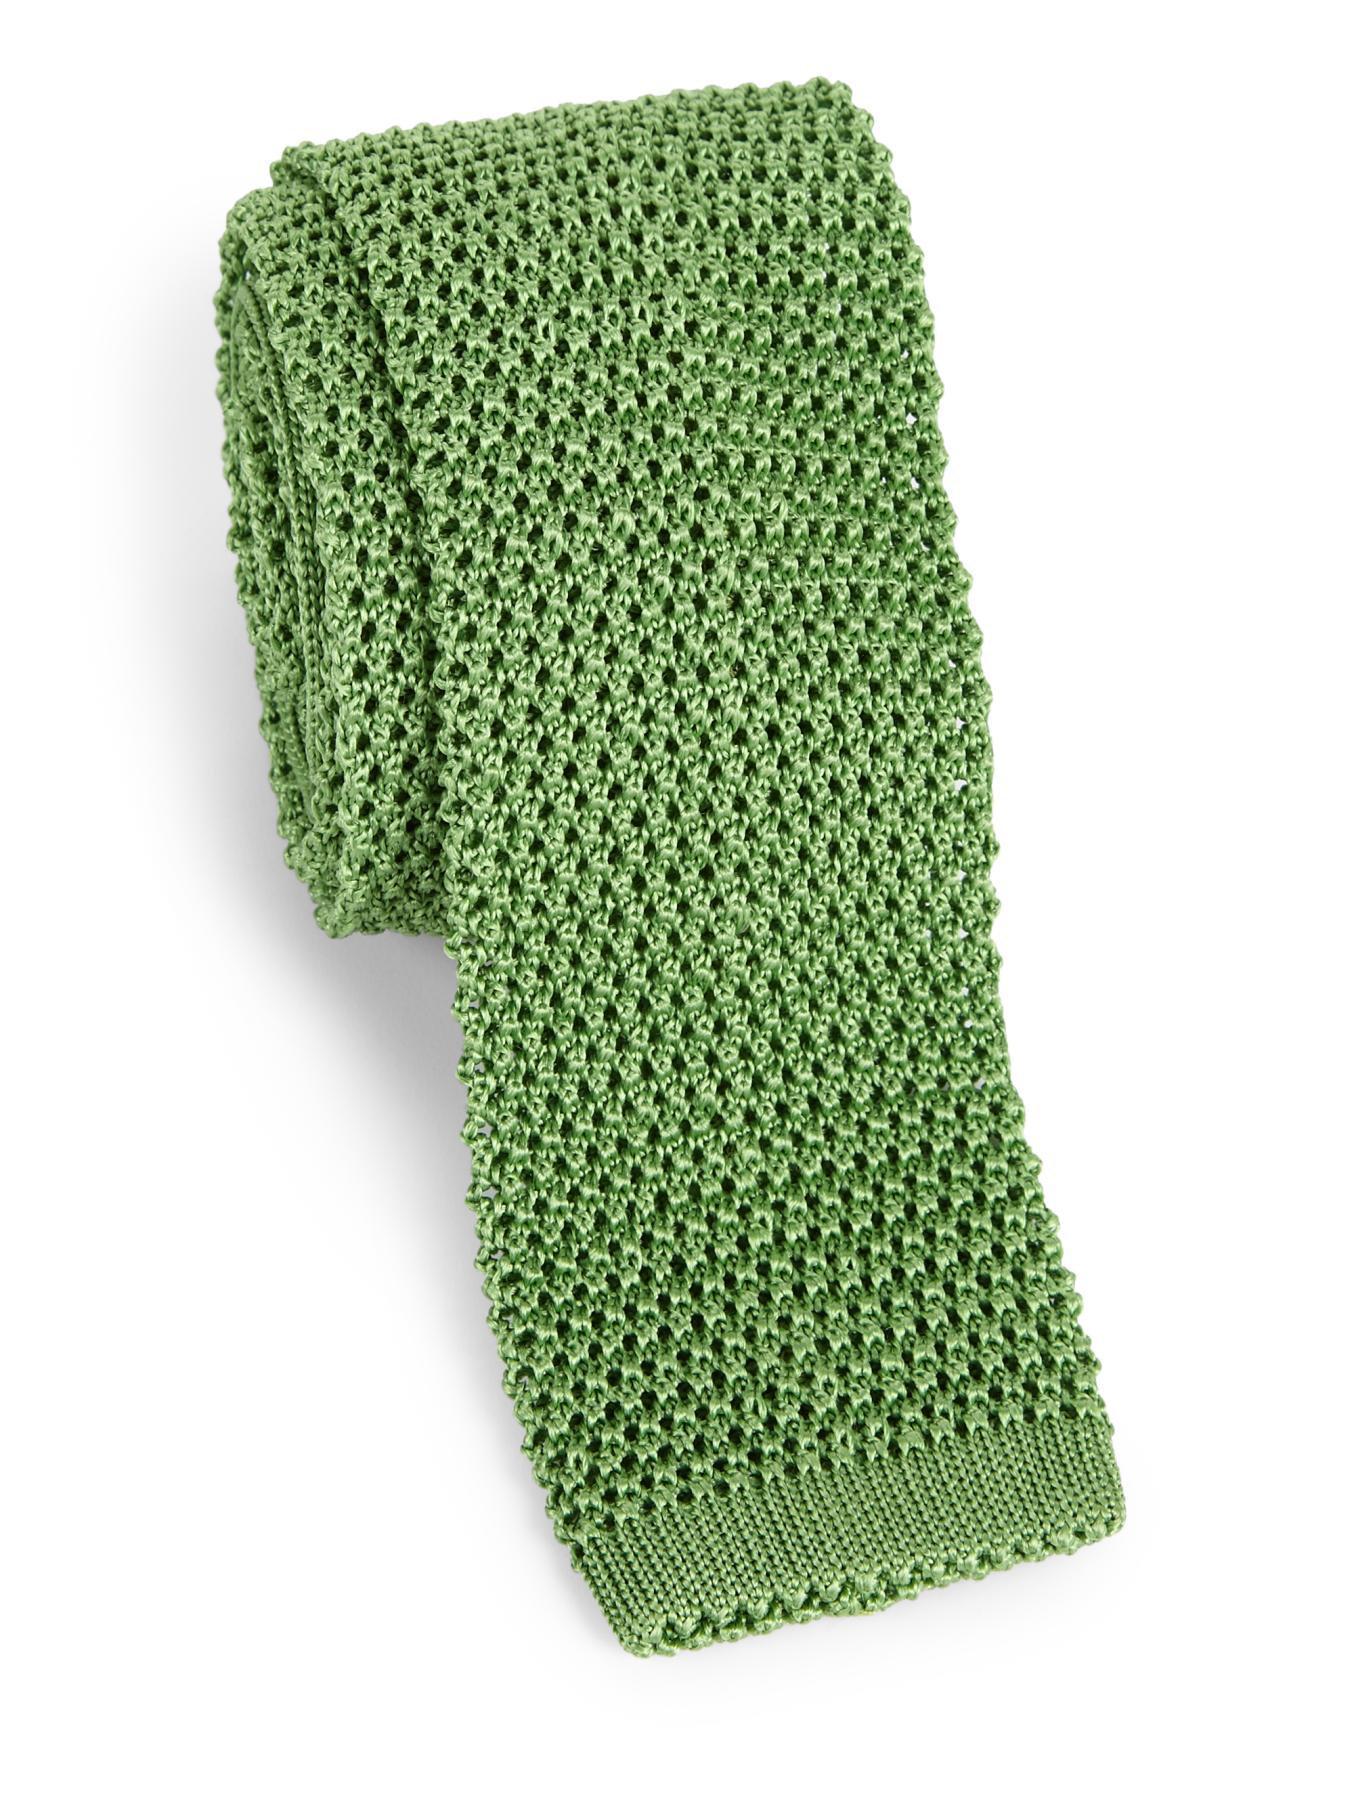 Lyst - Charvet Solid Silk Knit Tie in Green for Men